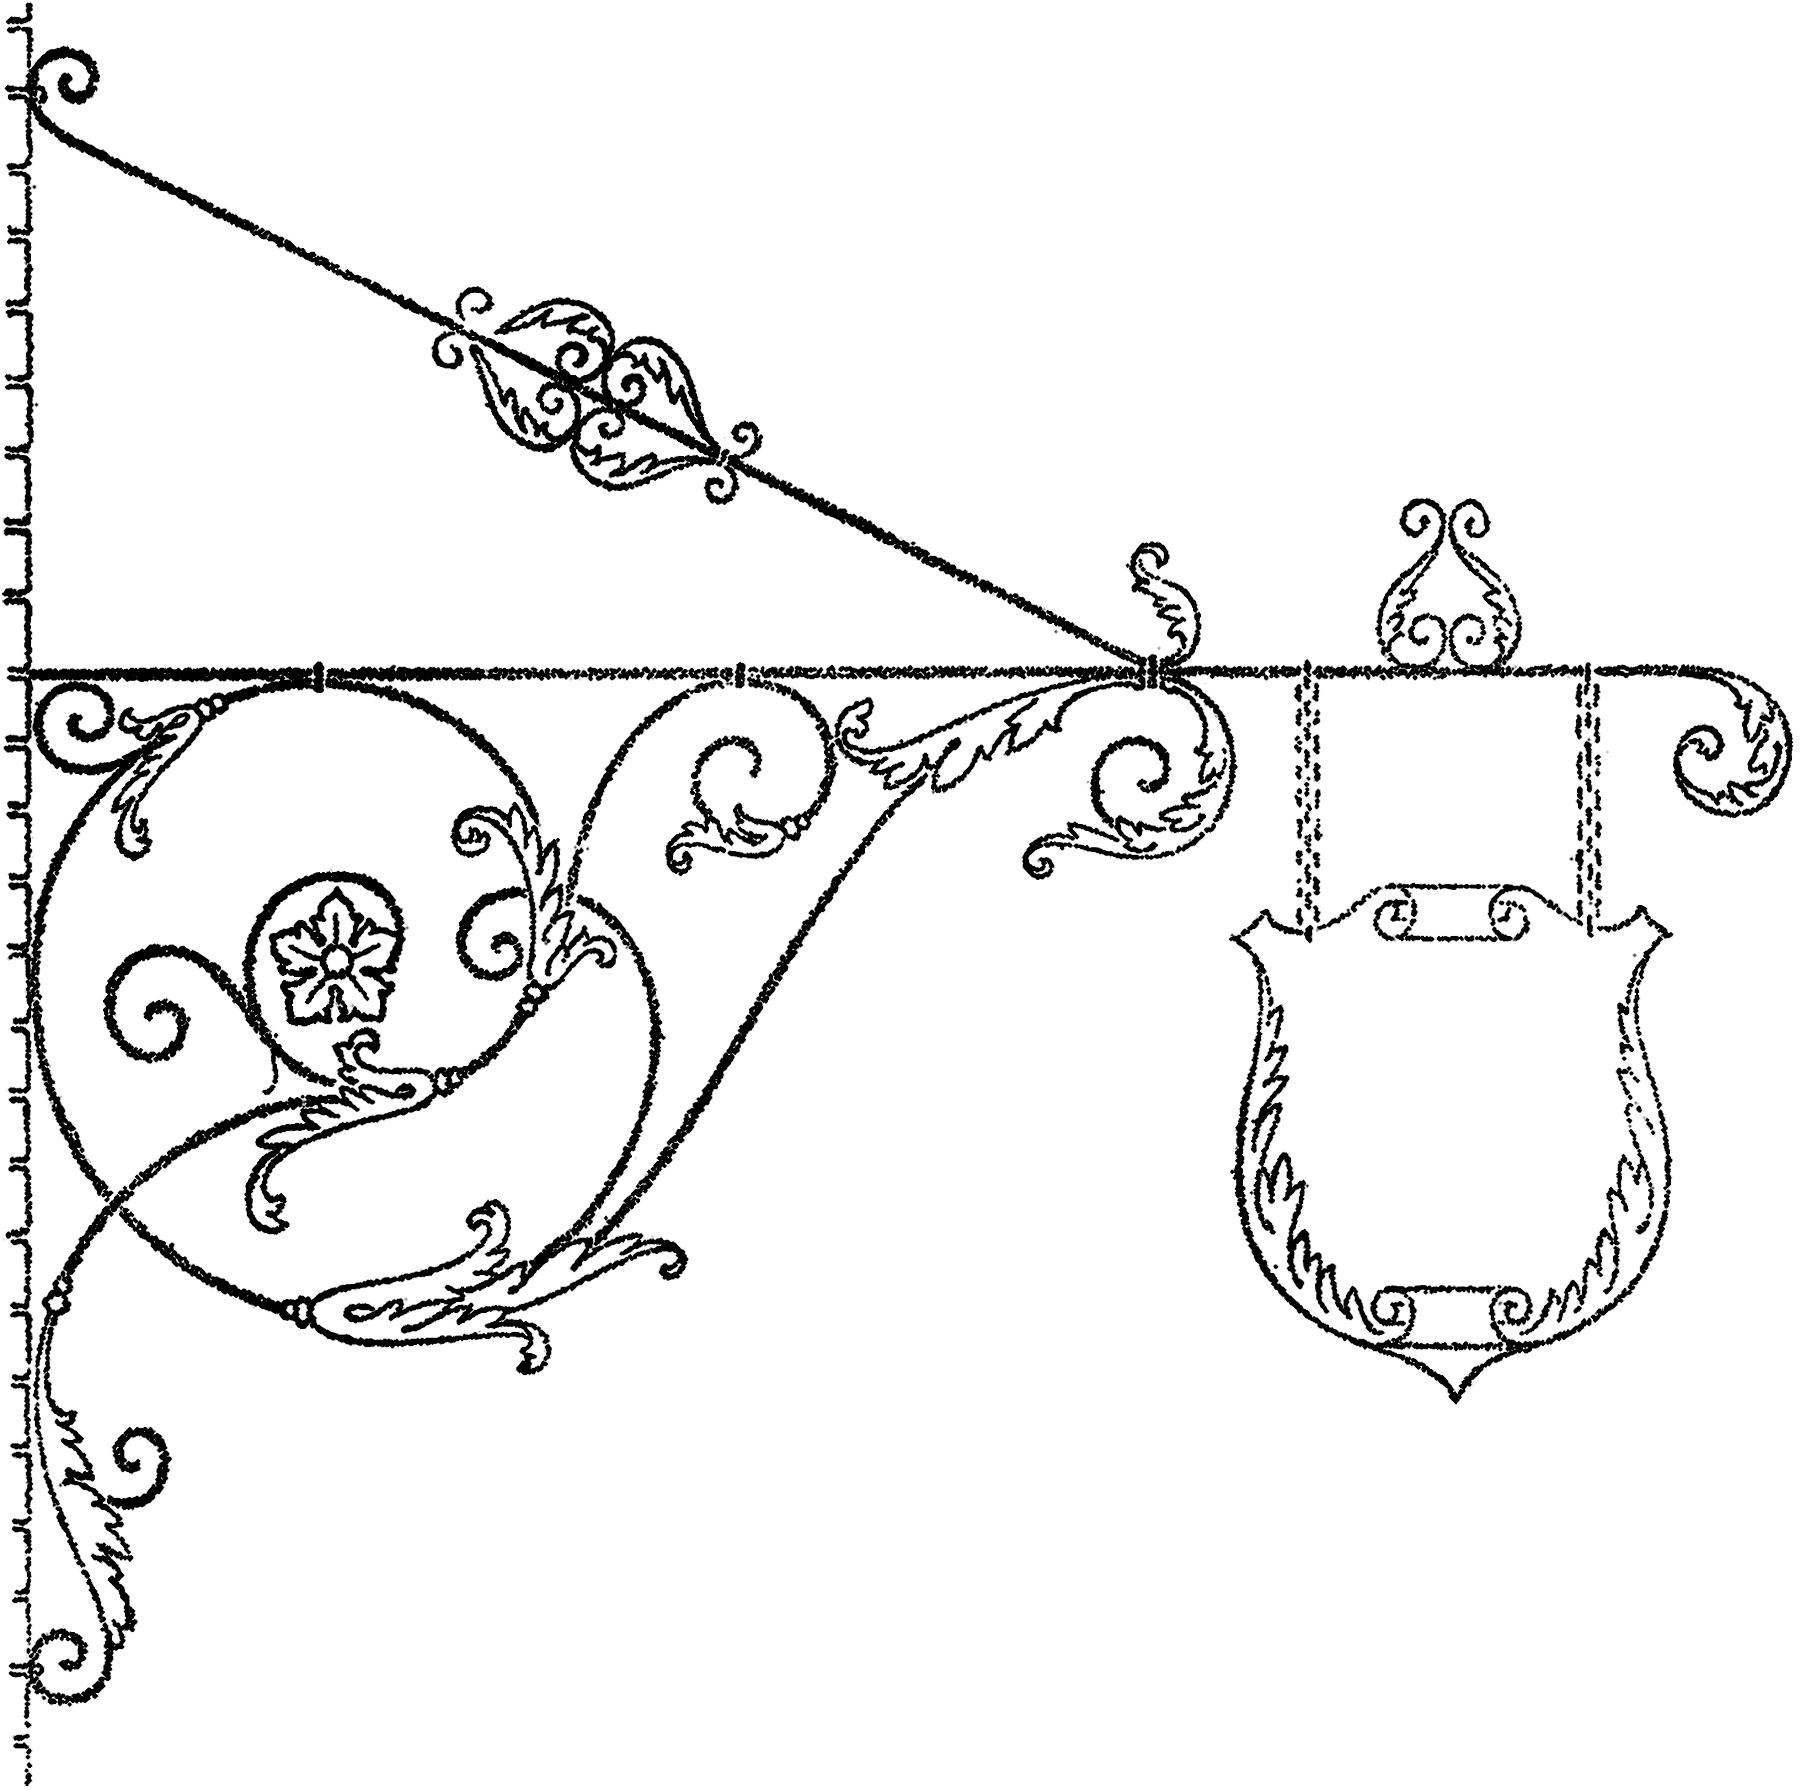 Fancy Scrolls Sign Image